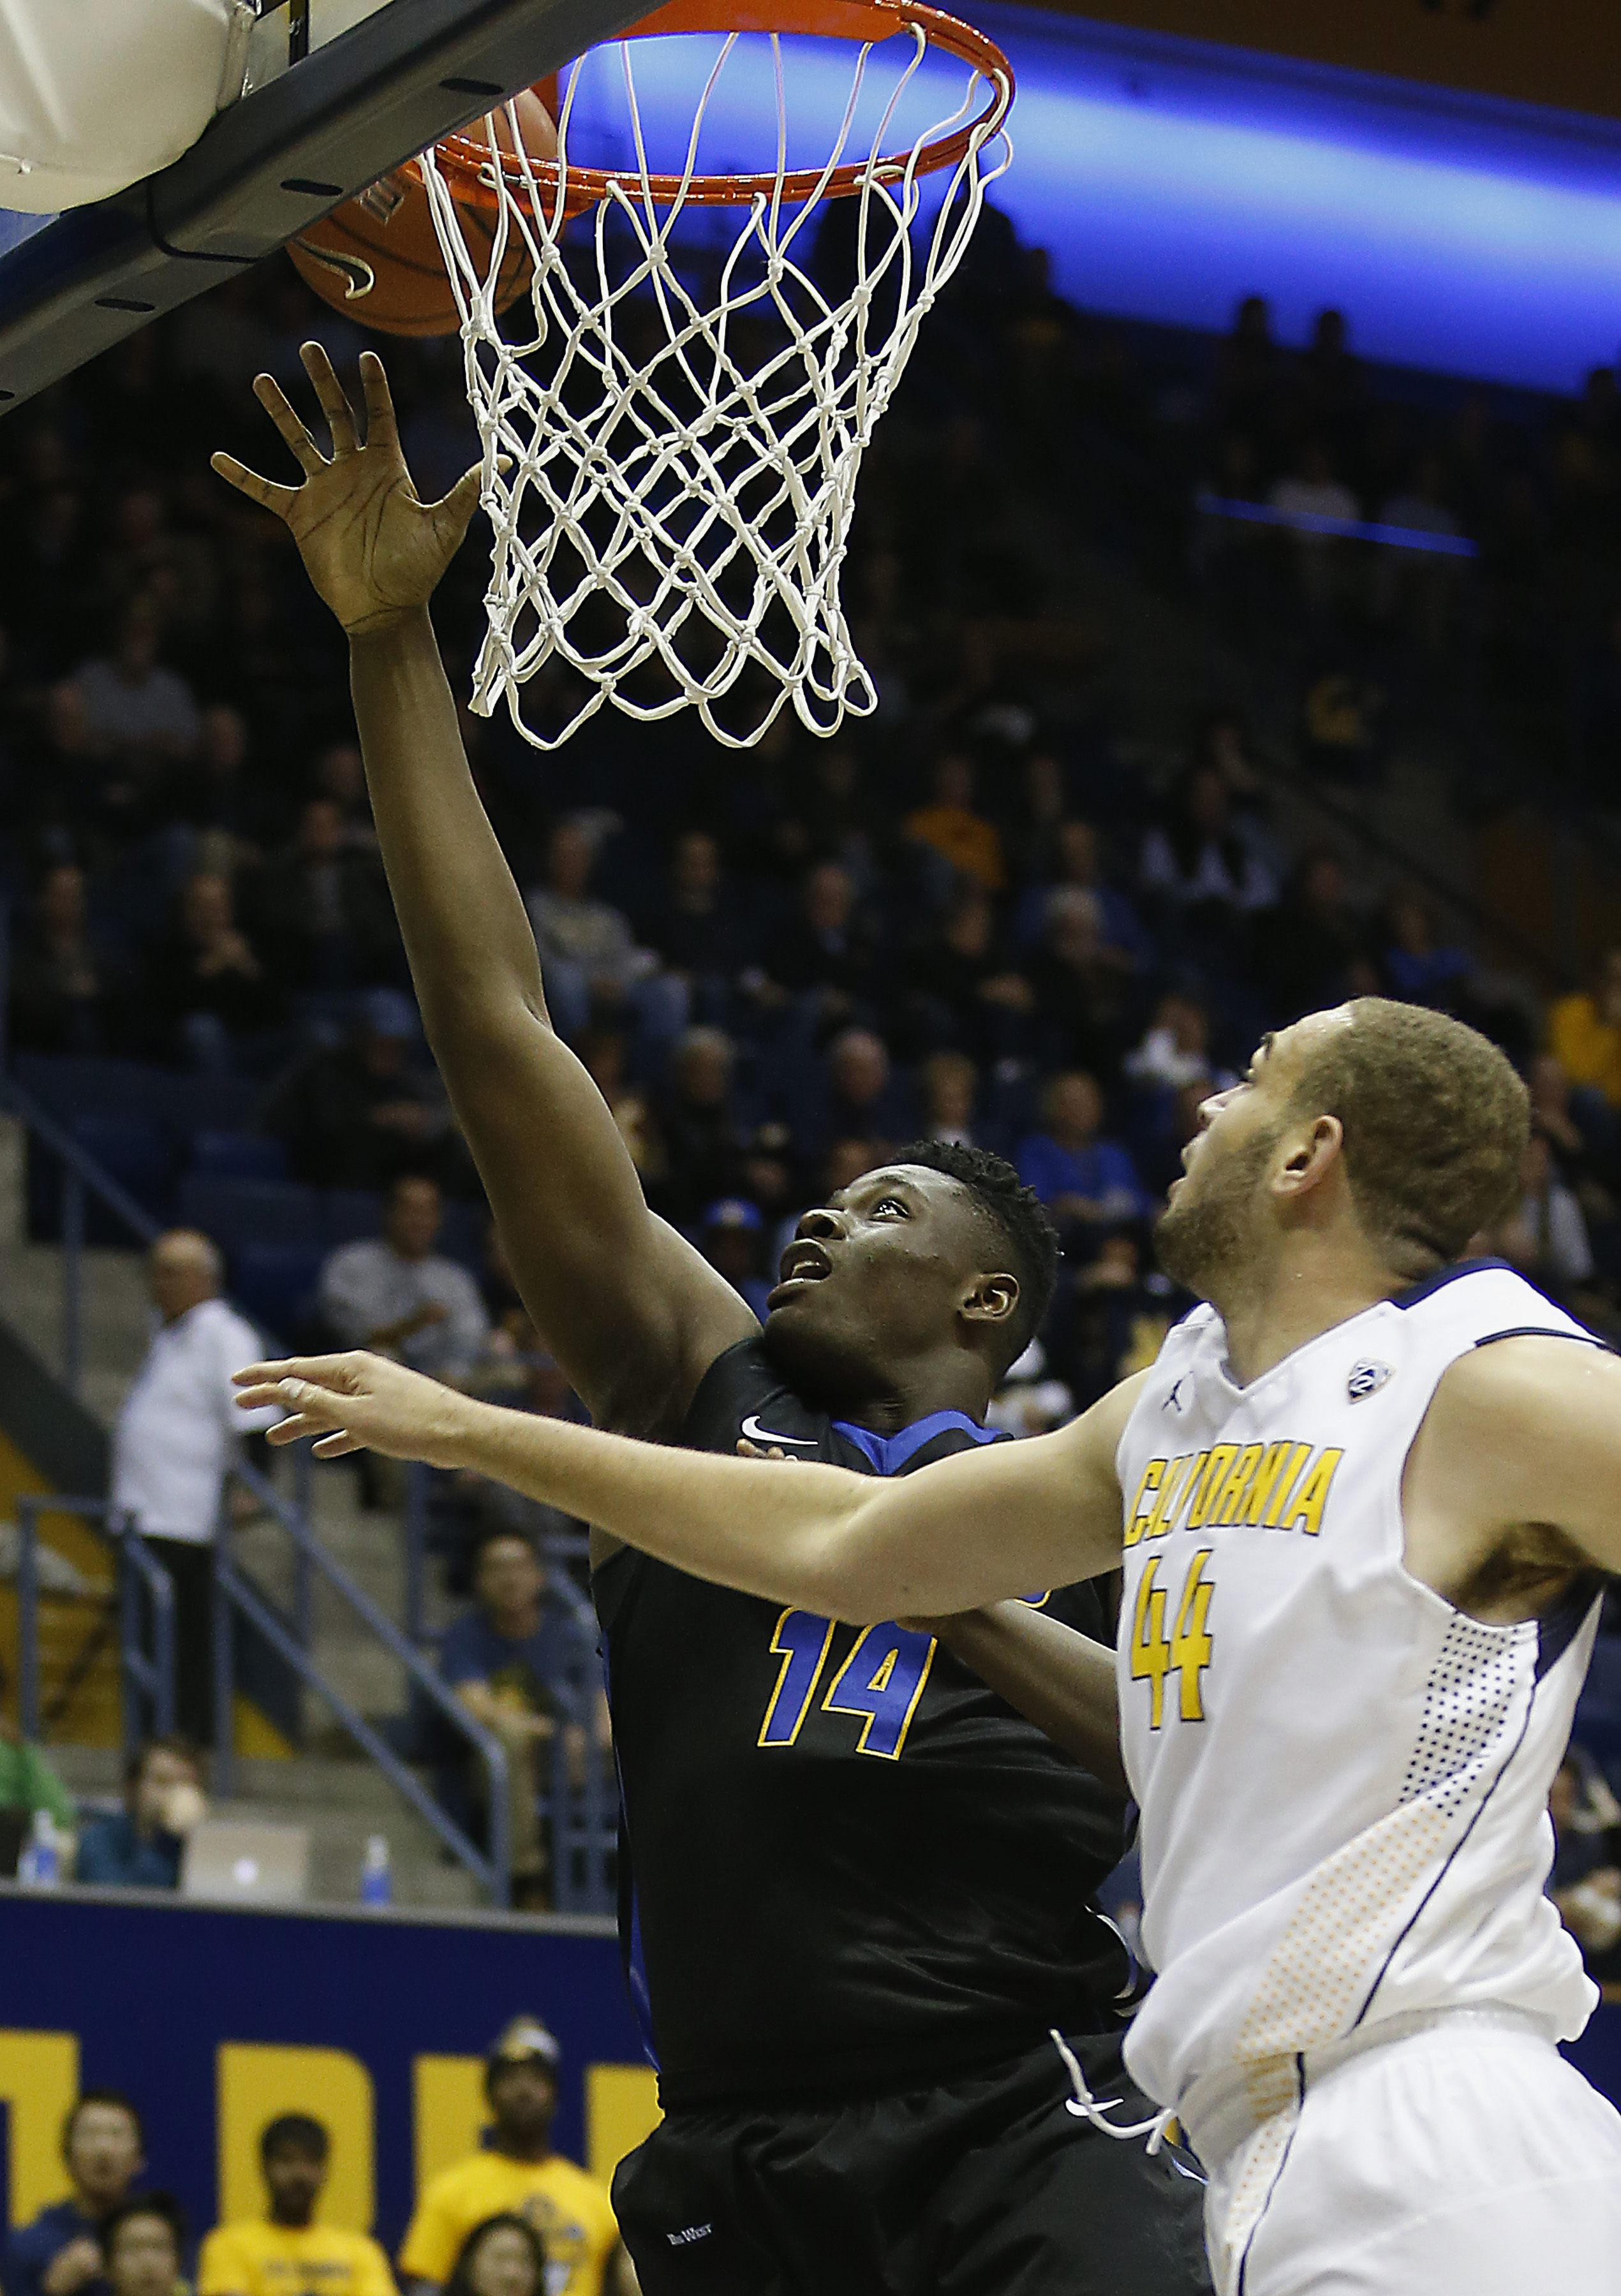 UC Santa Barbara forward Ami Lakoju (14) shoots over California center Kameron Rooks (44) in the first half of an NCAA college basketball game, Monday, Nov. 16, 2015, in Berkeley, Calif. (AP Photo/Tony Avelar)